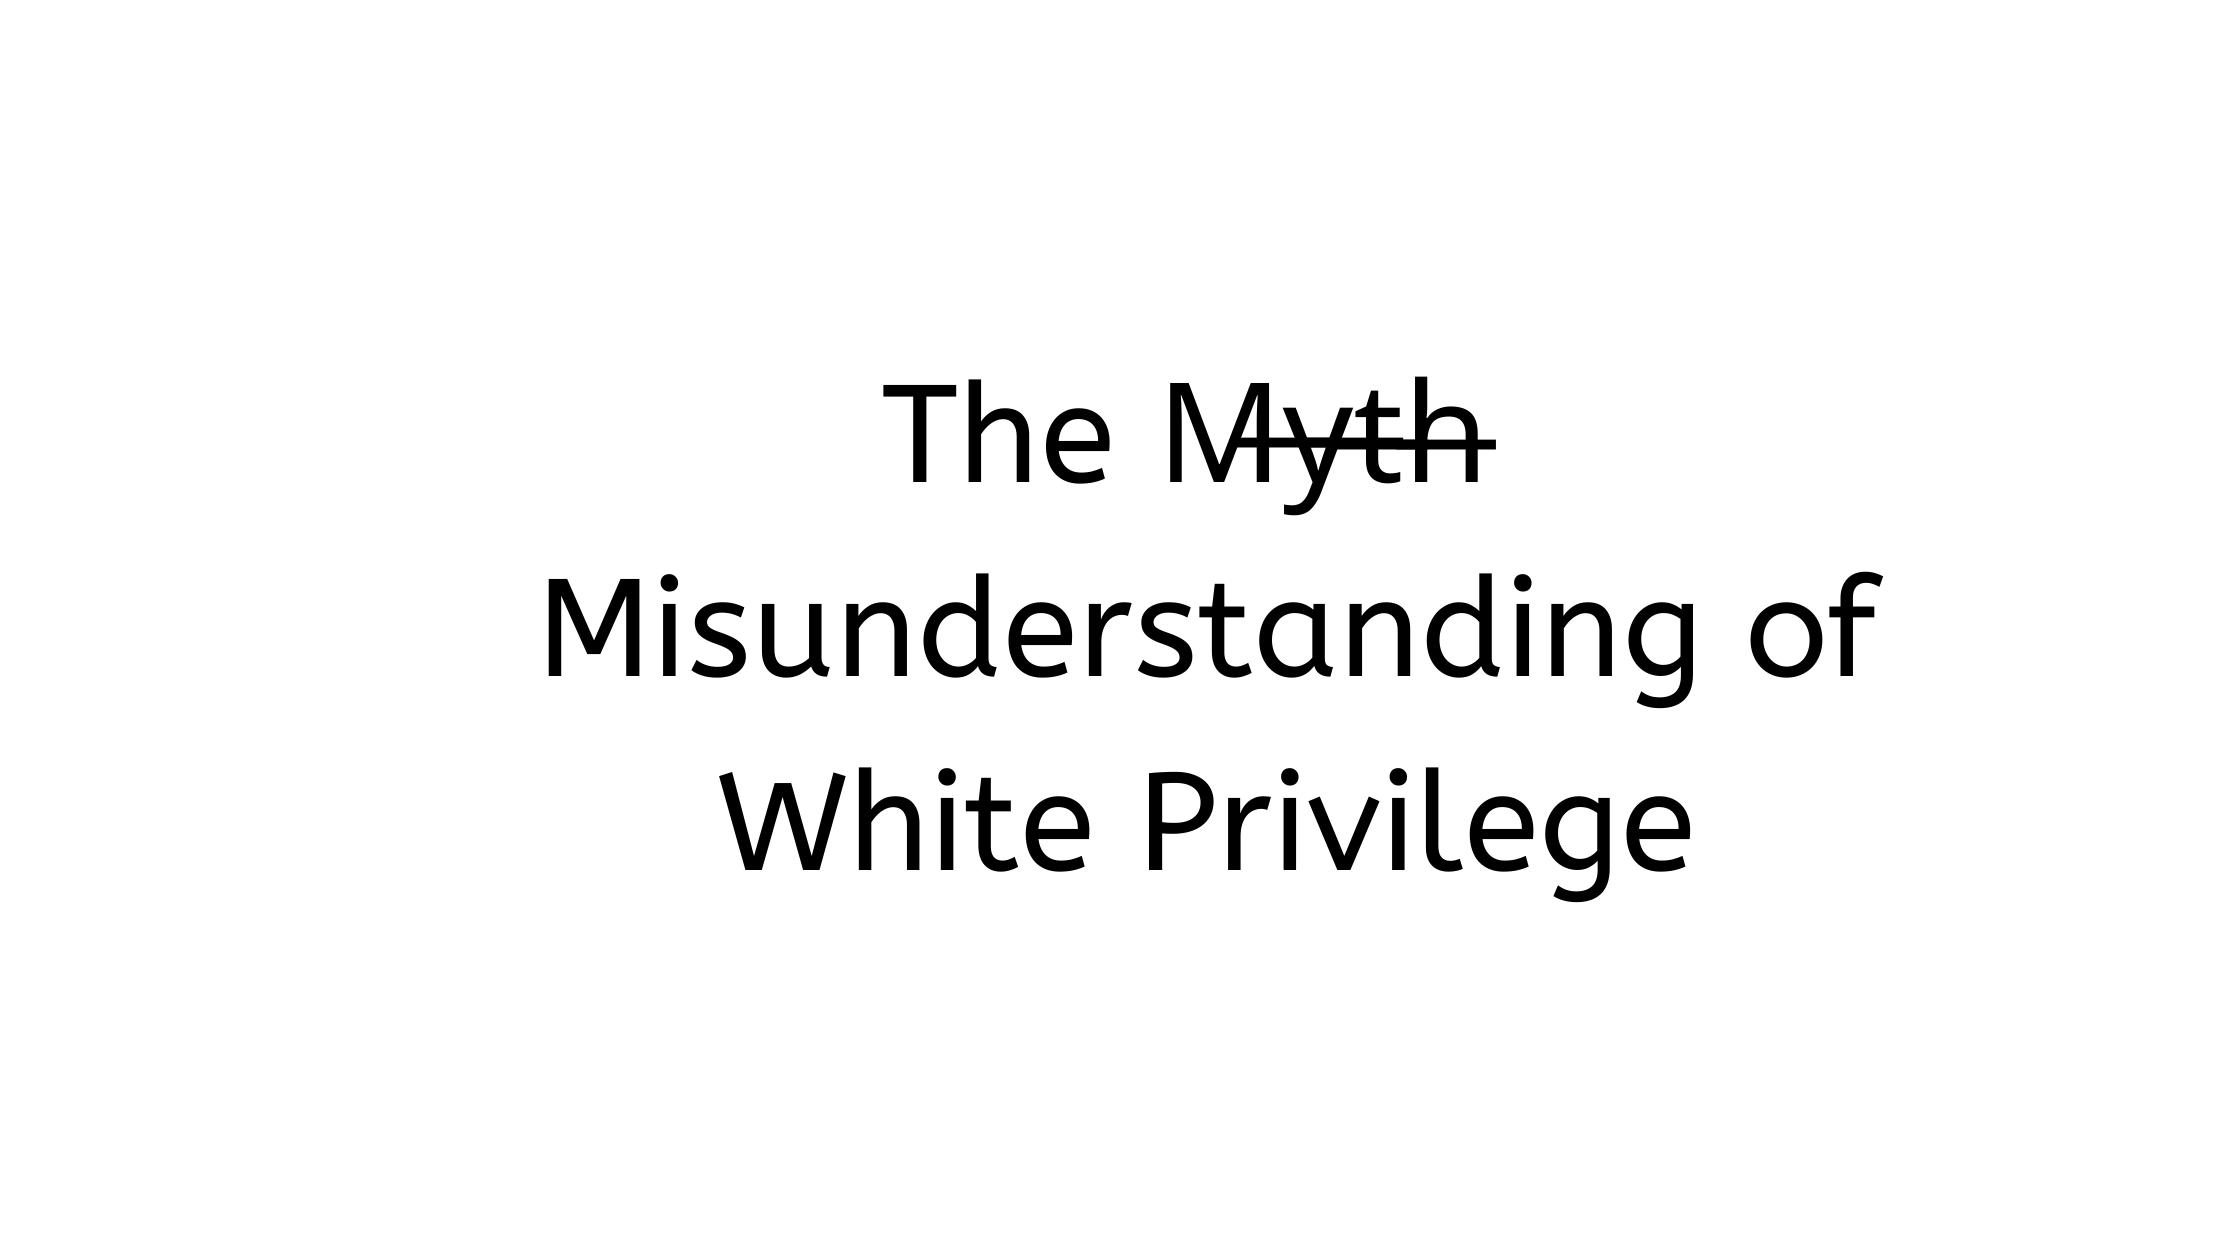 White Privilege myth